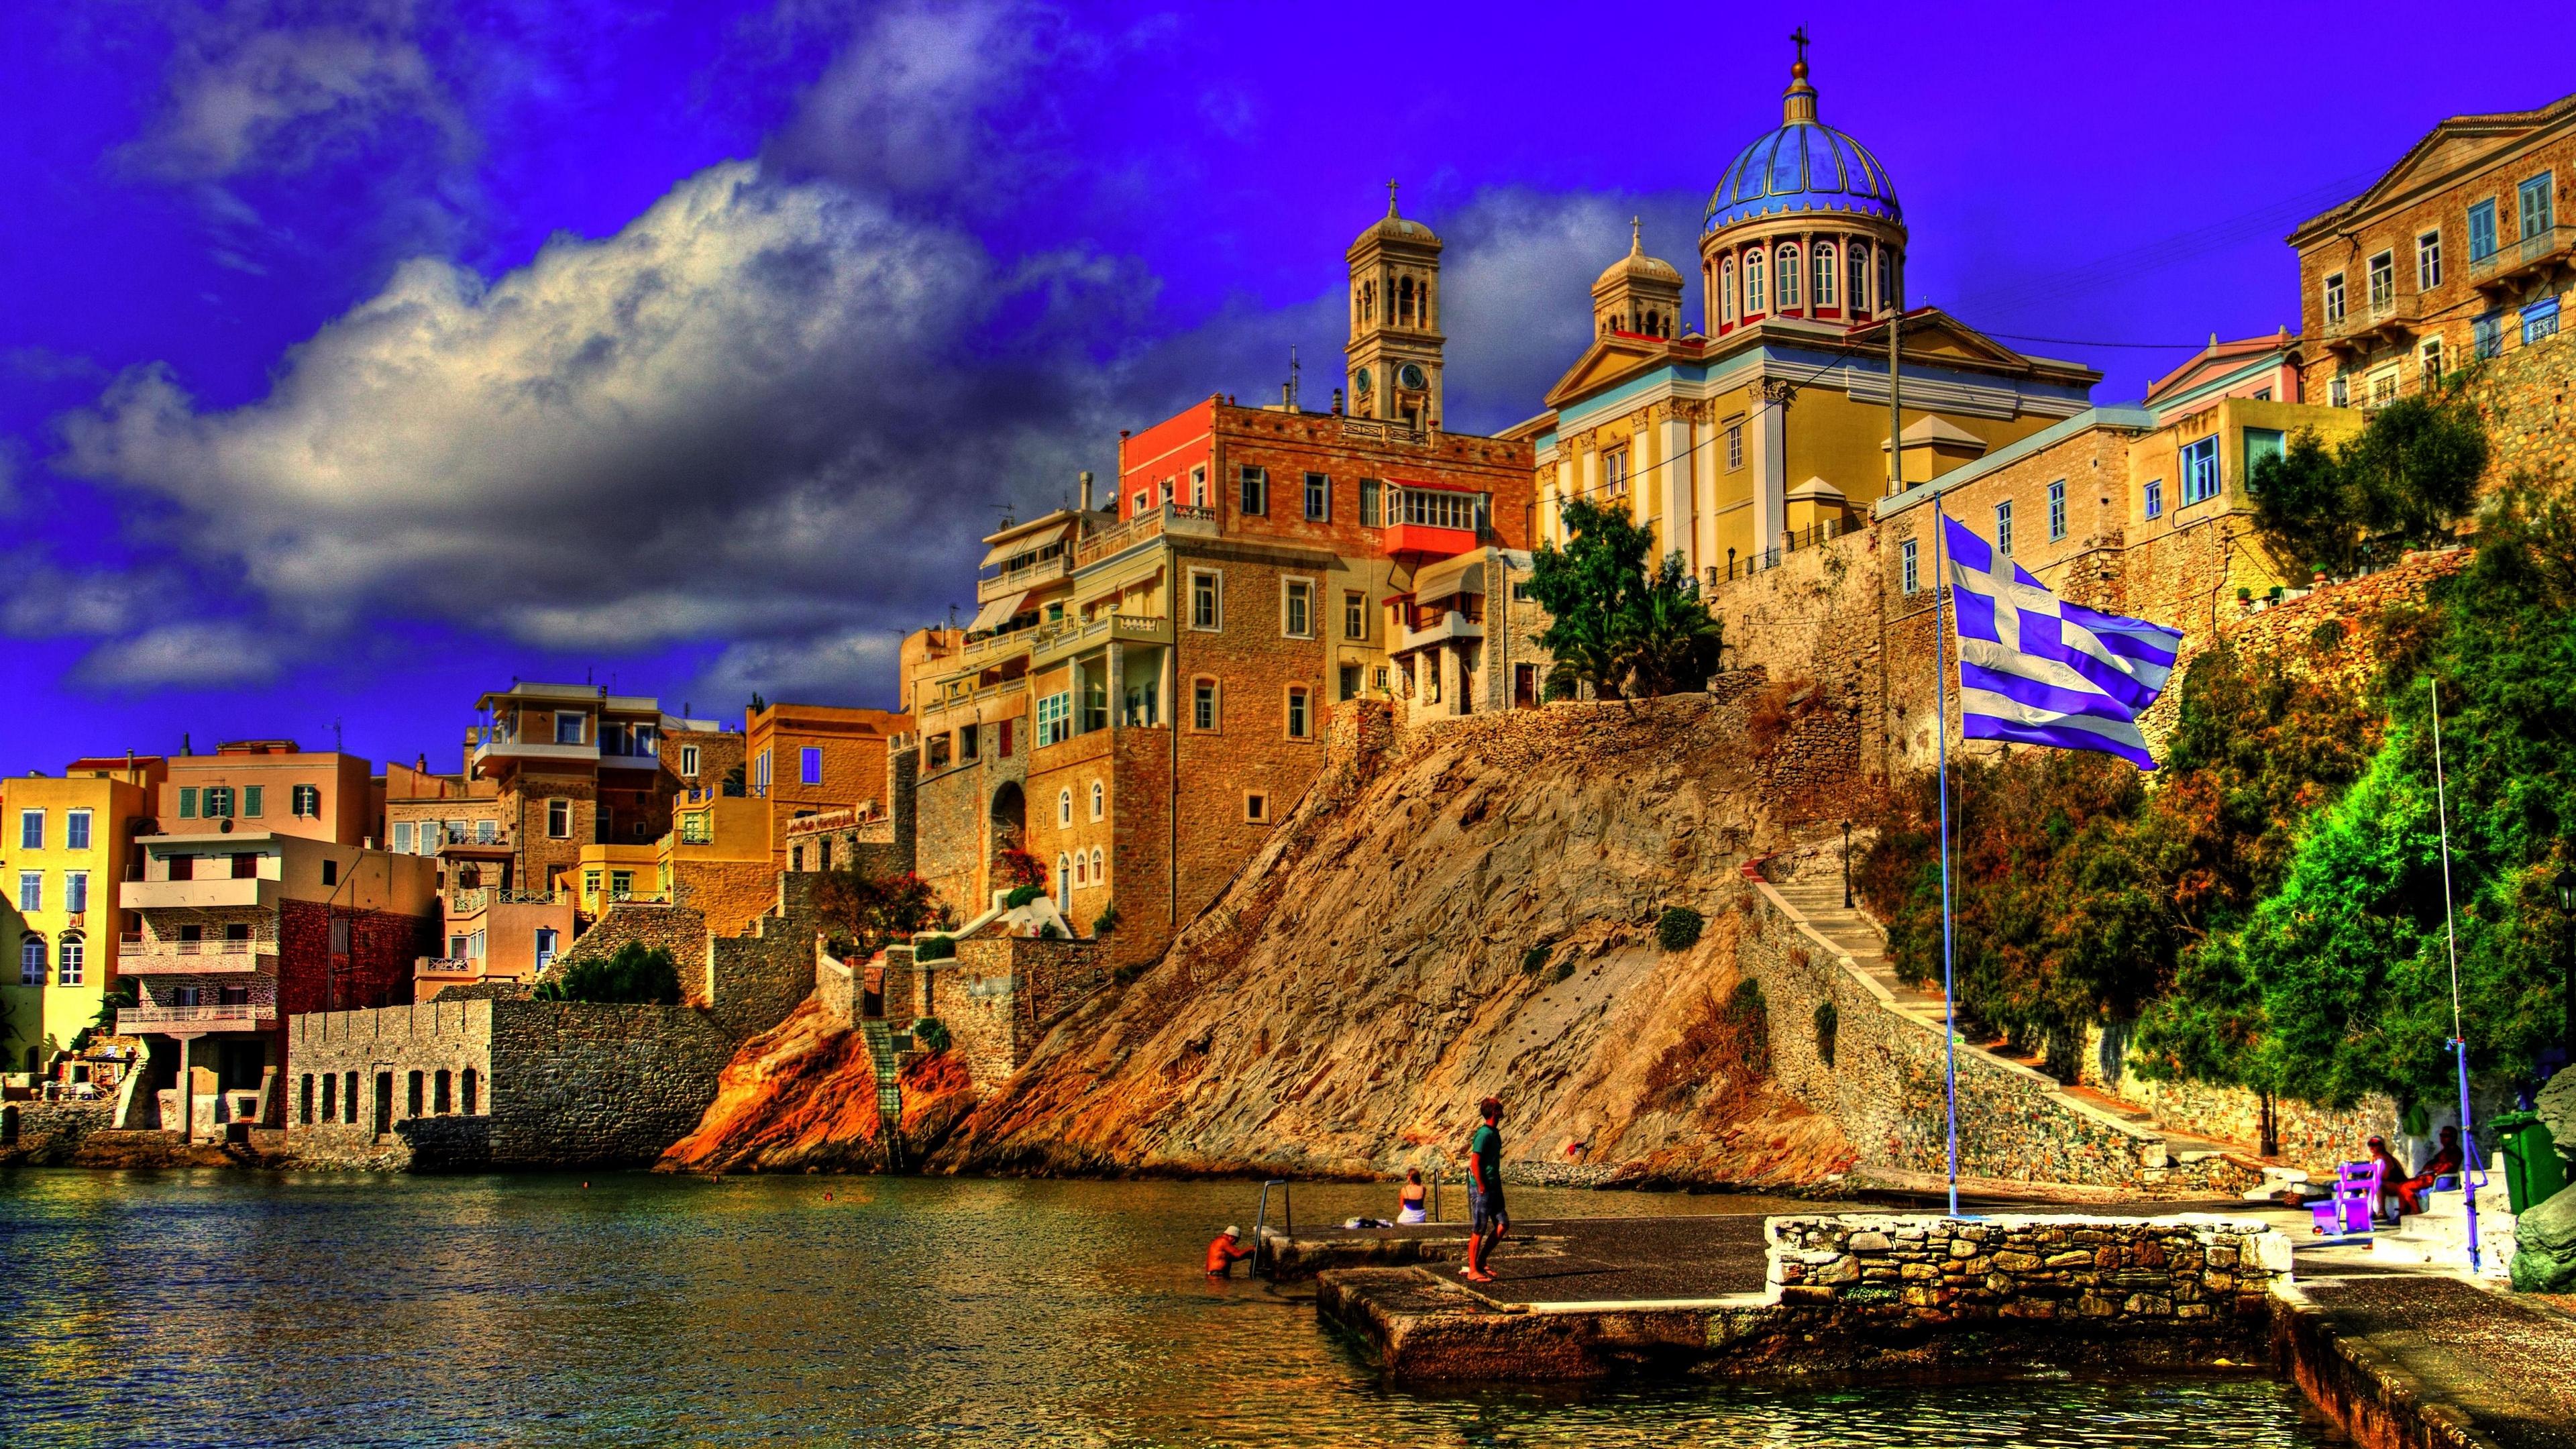 greece city sky buildings 4k 1538068204 - greece, city, sky, buildings 4k - Sky, Greece, City